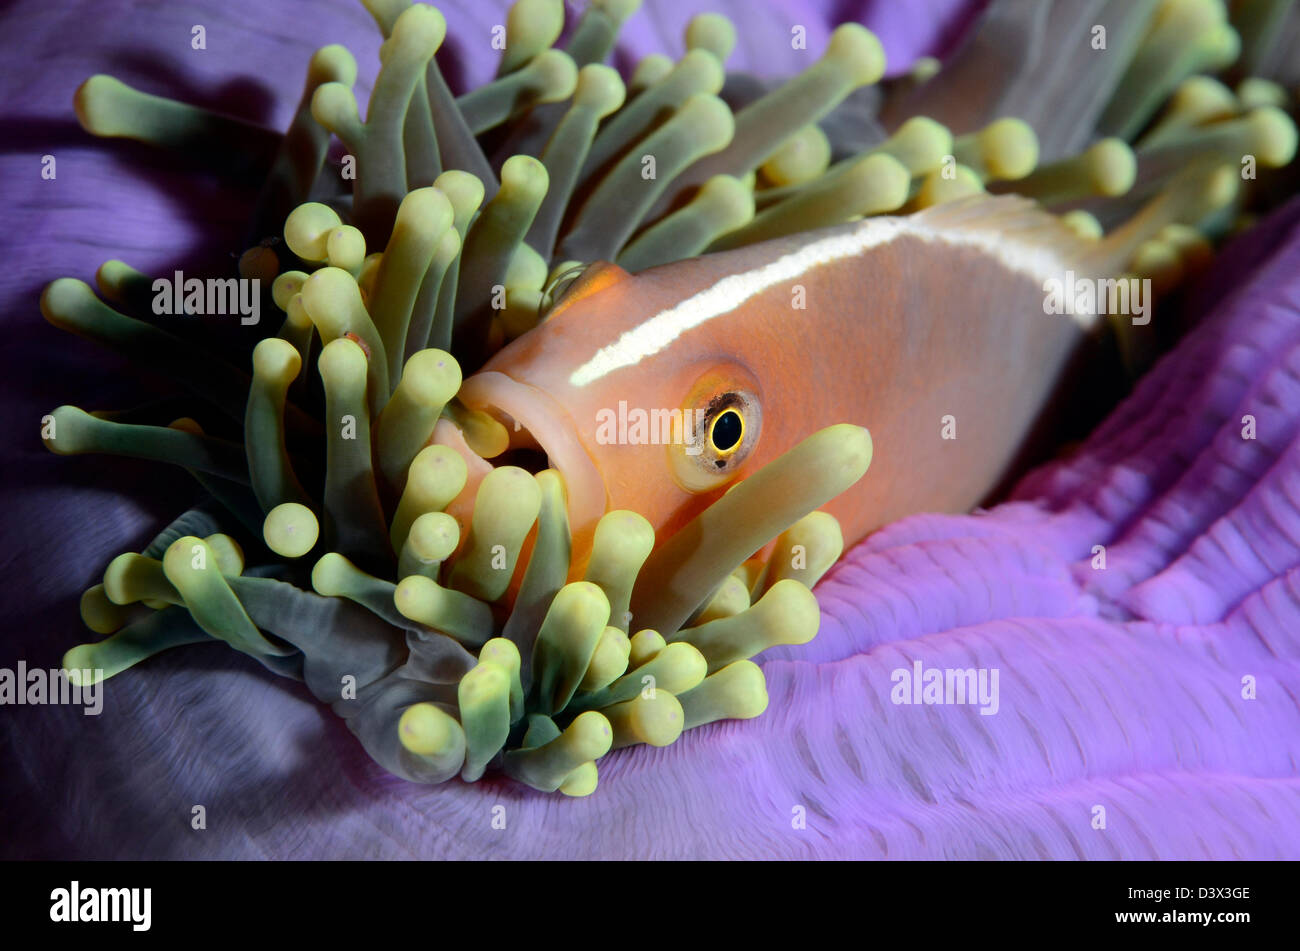 O Skunk Anemonefish, Amphiprion sandaracinos, Ilhas Similan, Tailândia Imagens de Stock